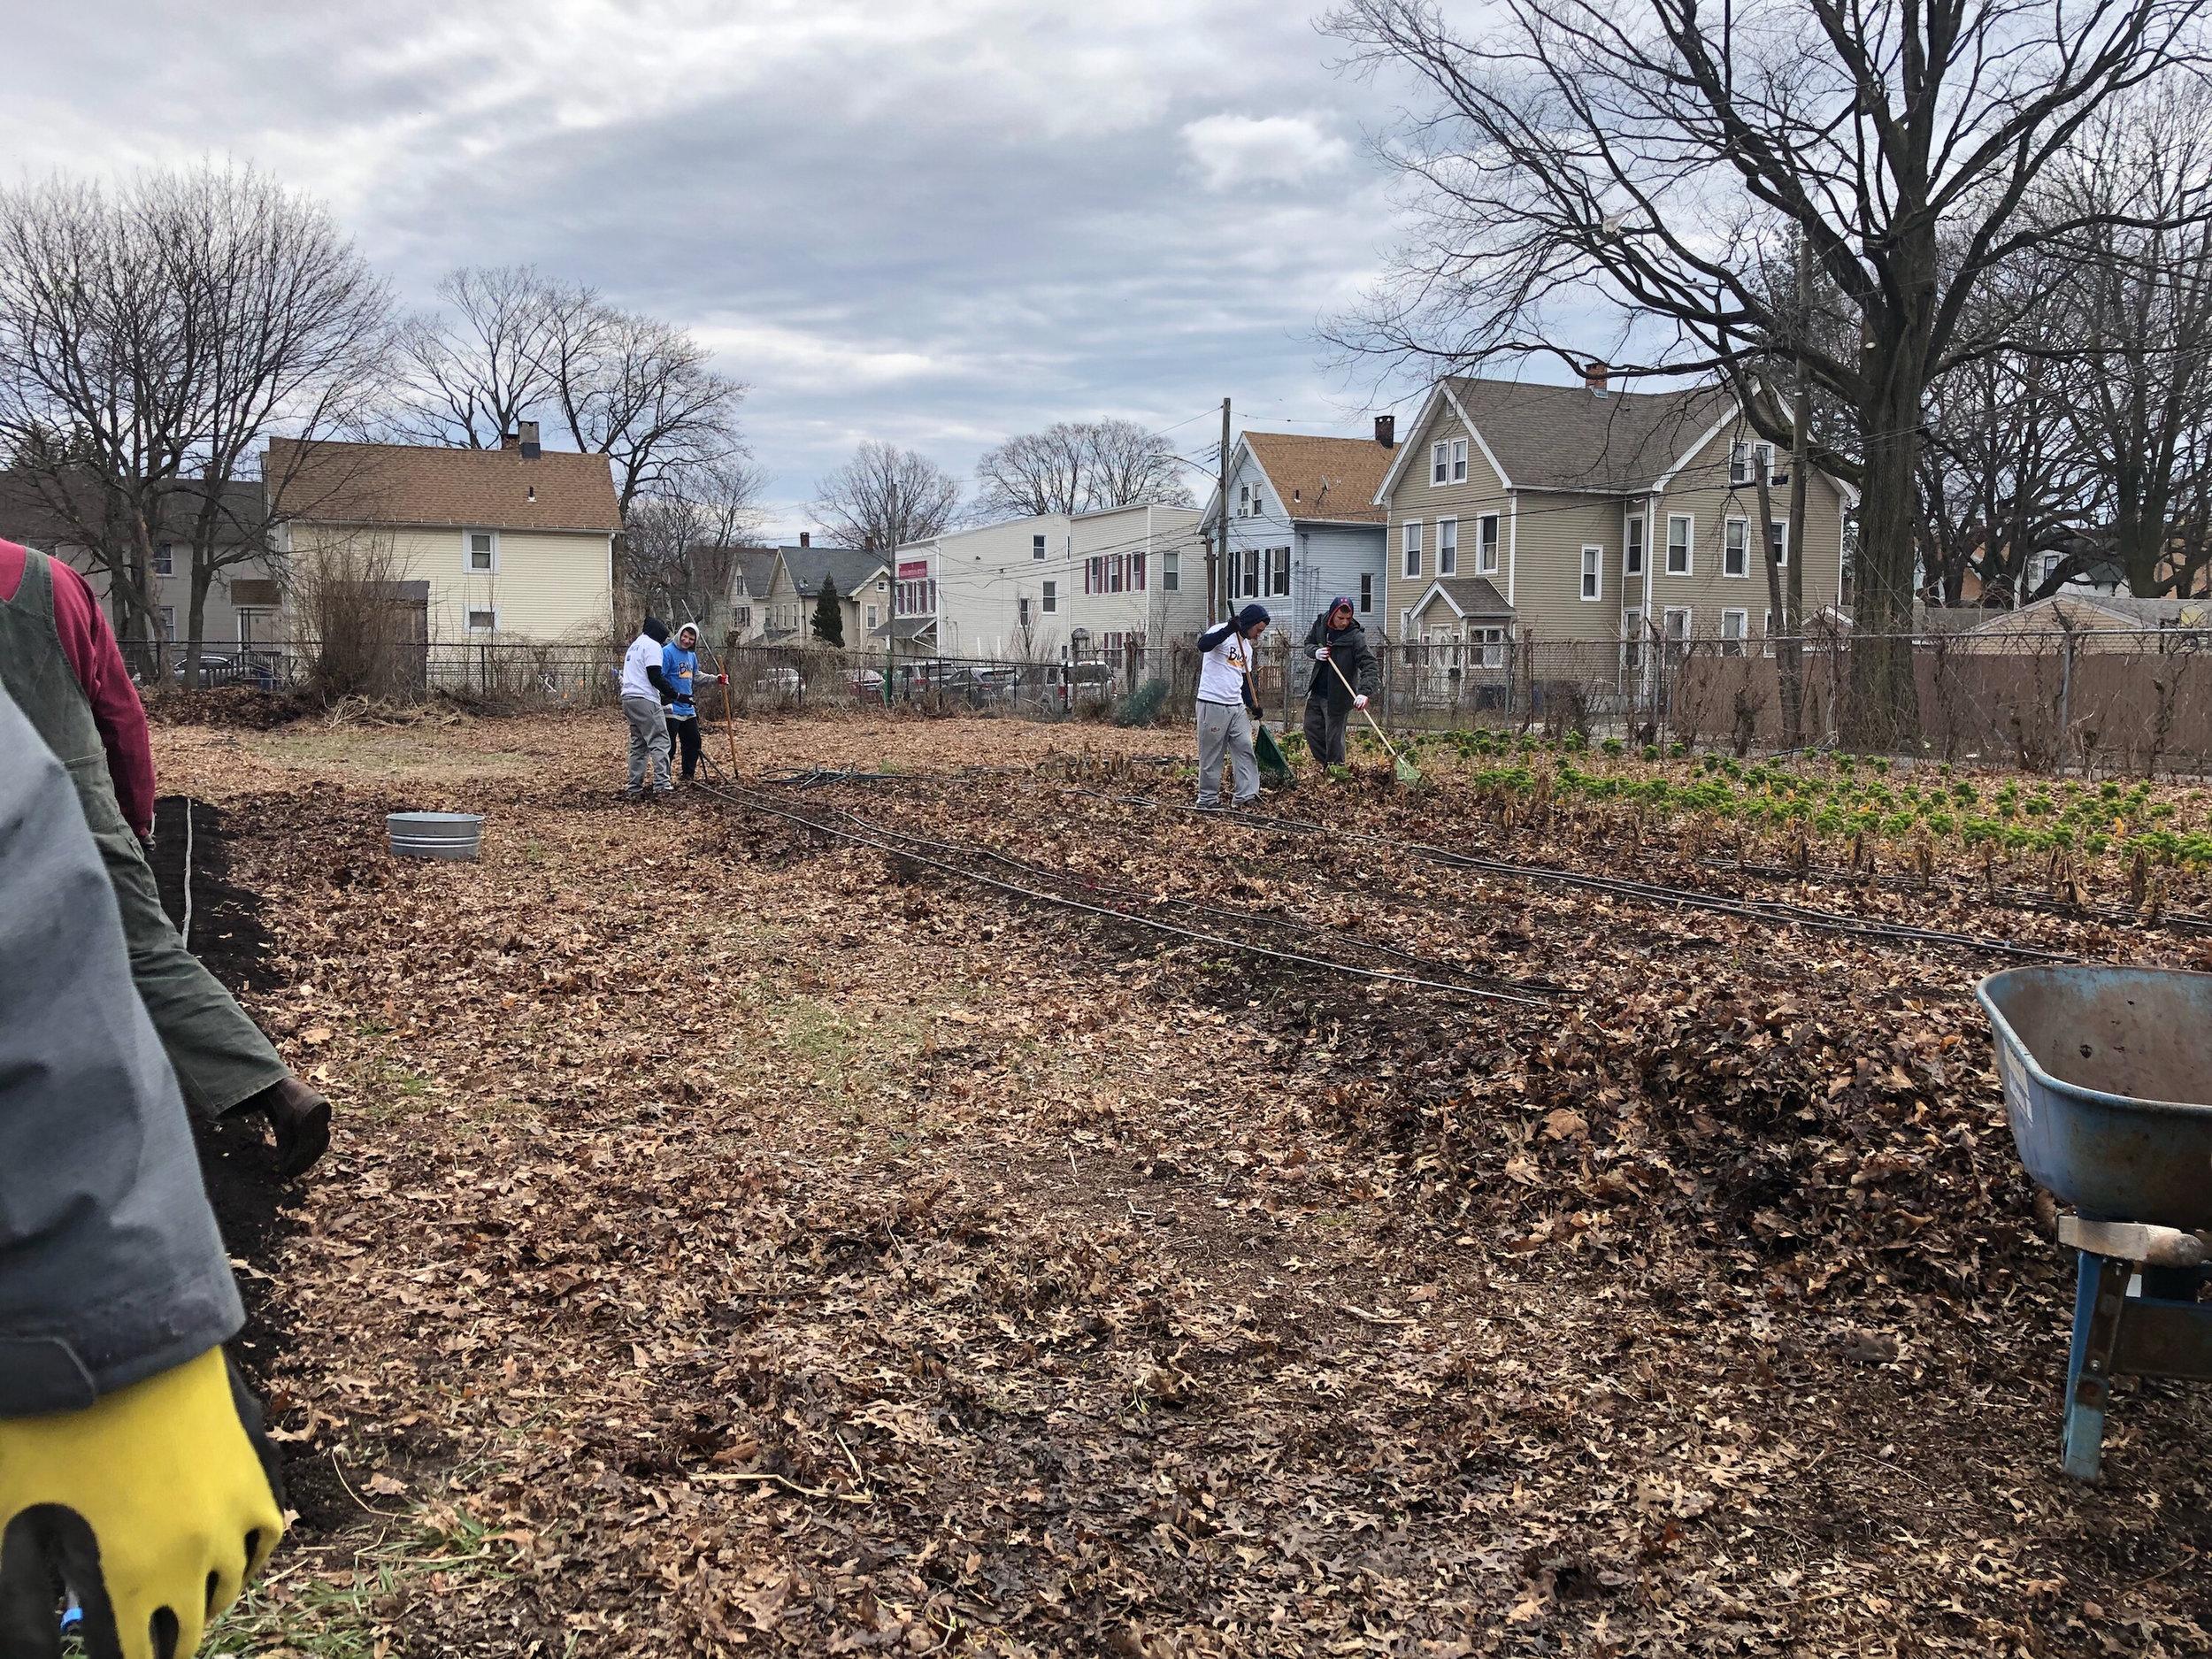 Members of the Quinnipiac fraternity Zeta Beta Tau working on gardens in New Haven.